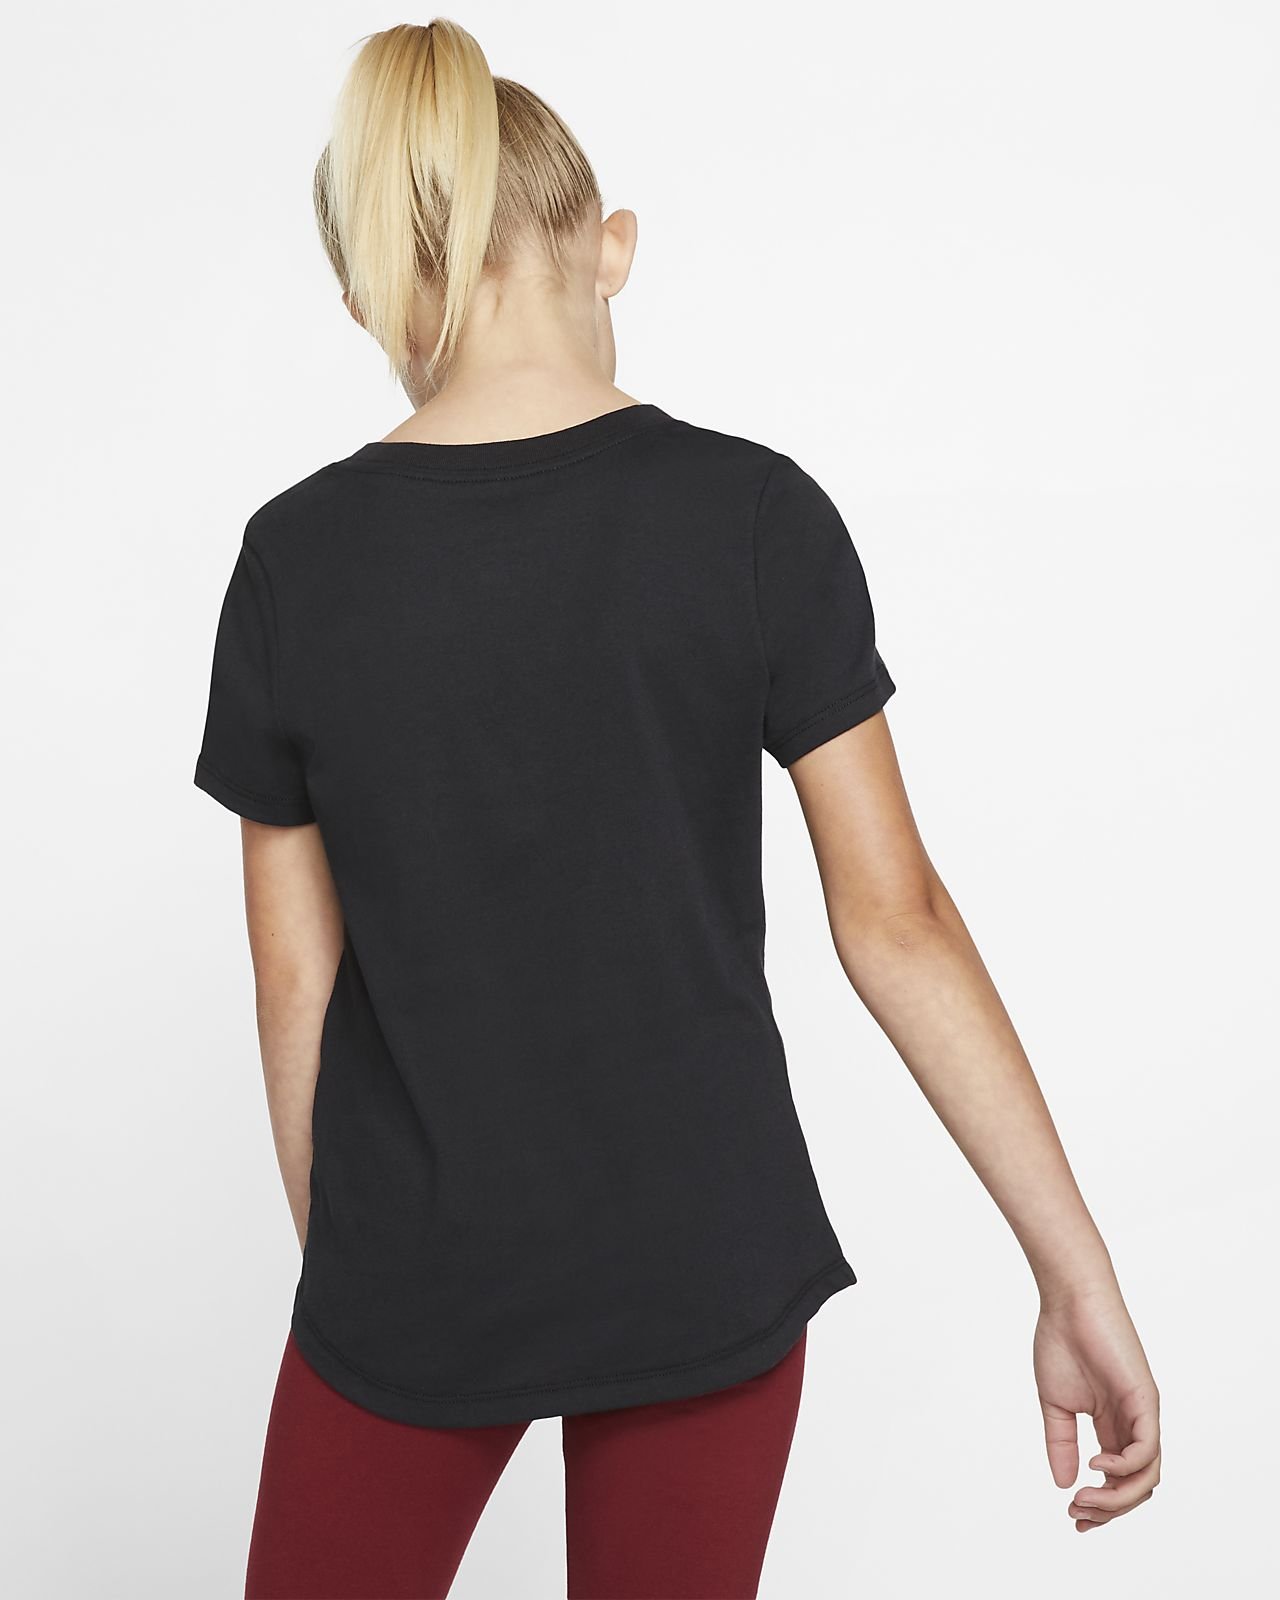 bbf37d80 Nike Dri-FIT trenings-T-skjorte for store barn (jente). Nike.com NO